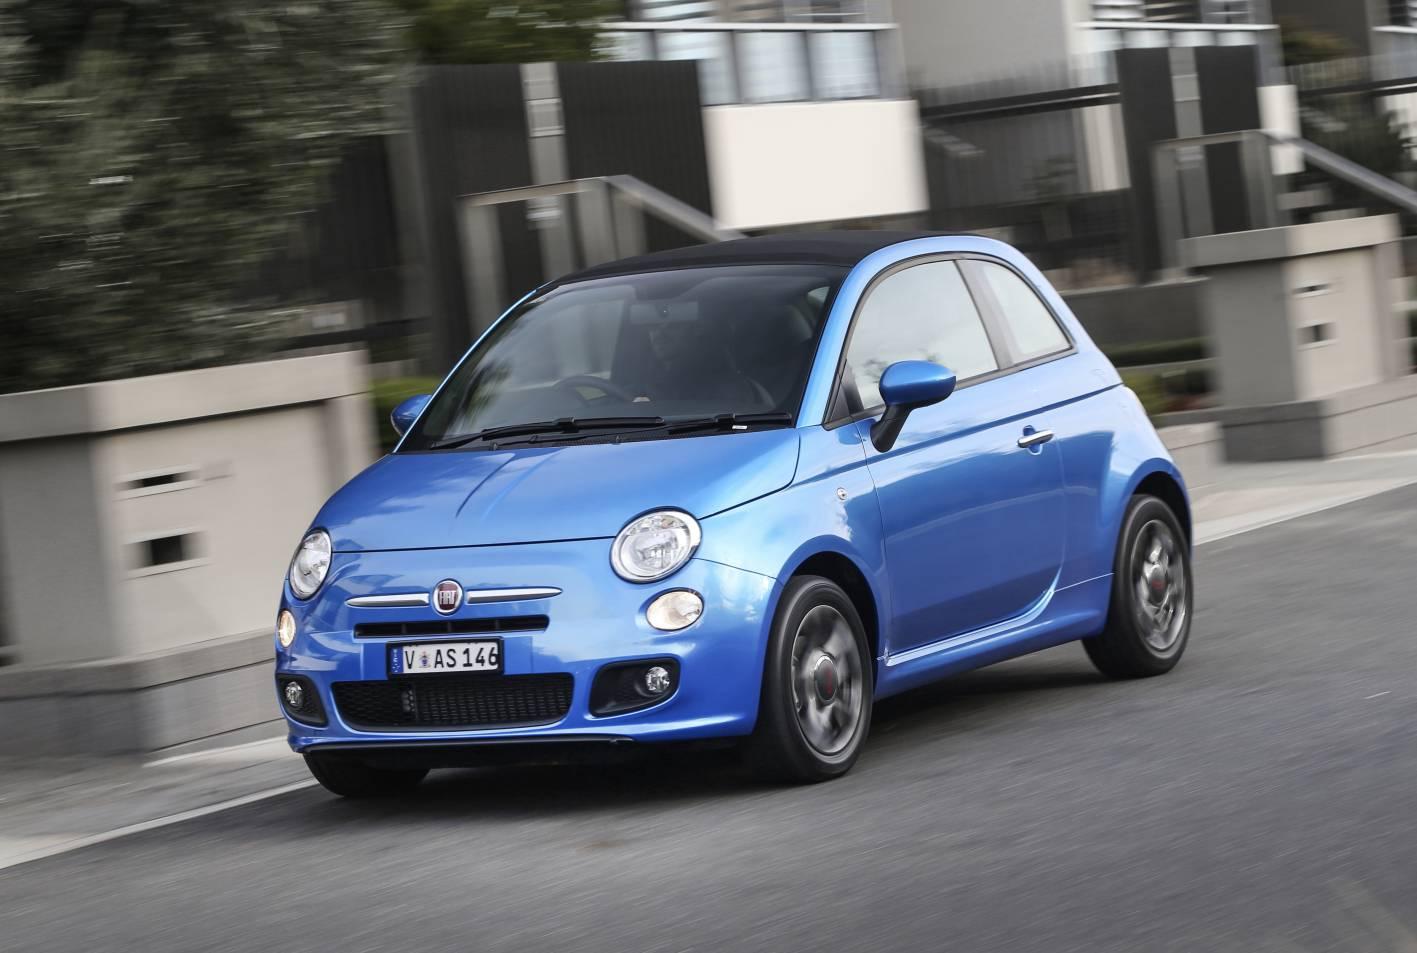 Fiat 500 Review: 2014 Fiat 500 Pop